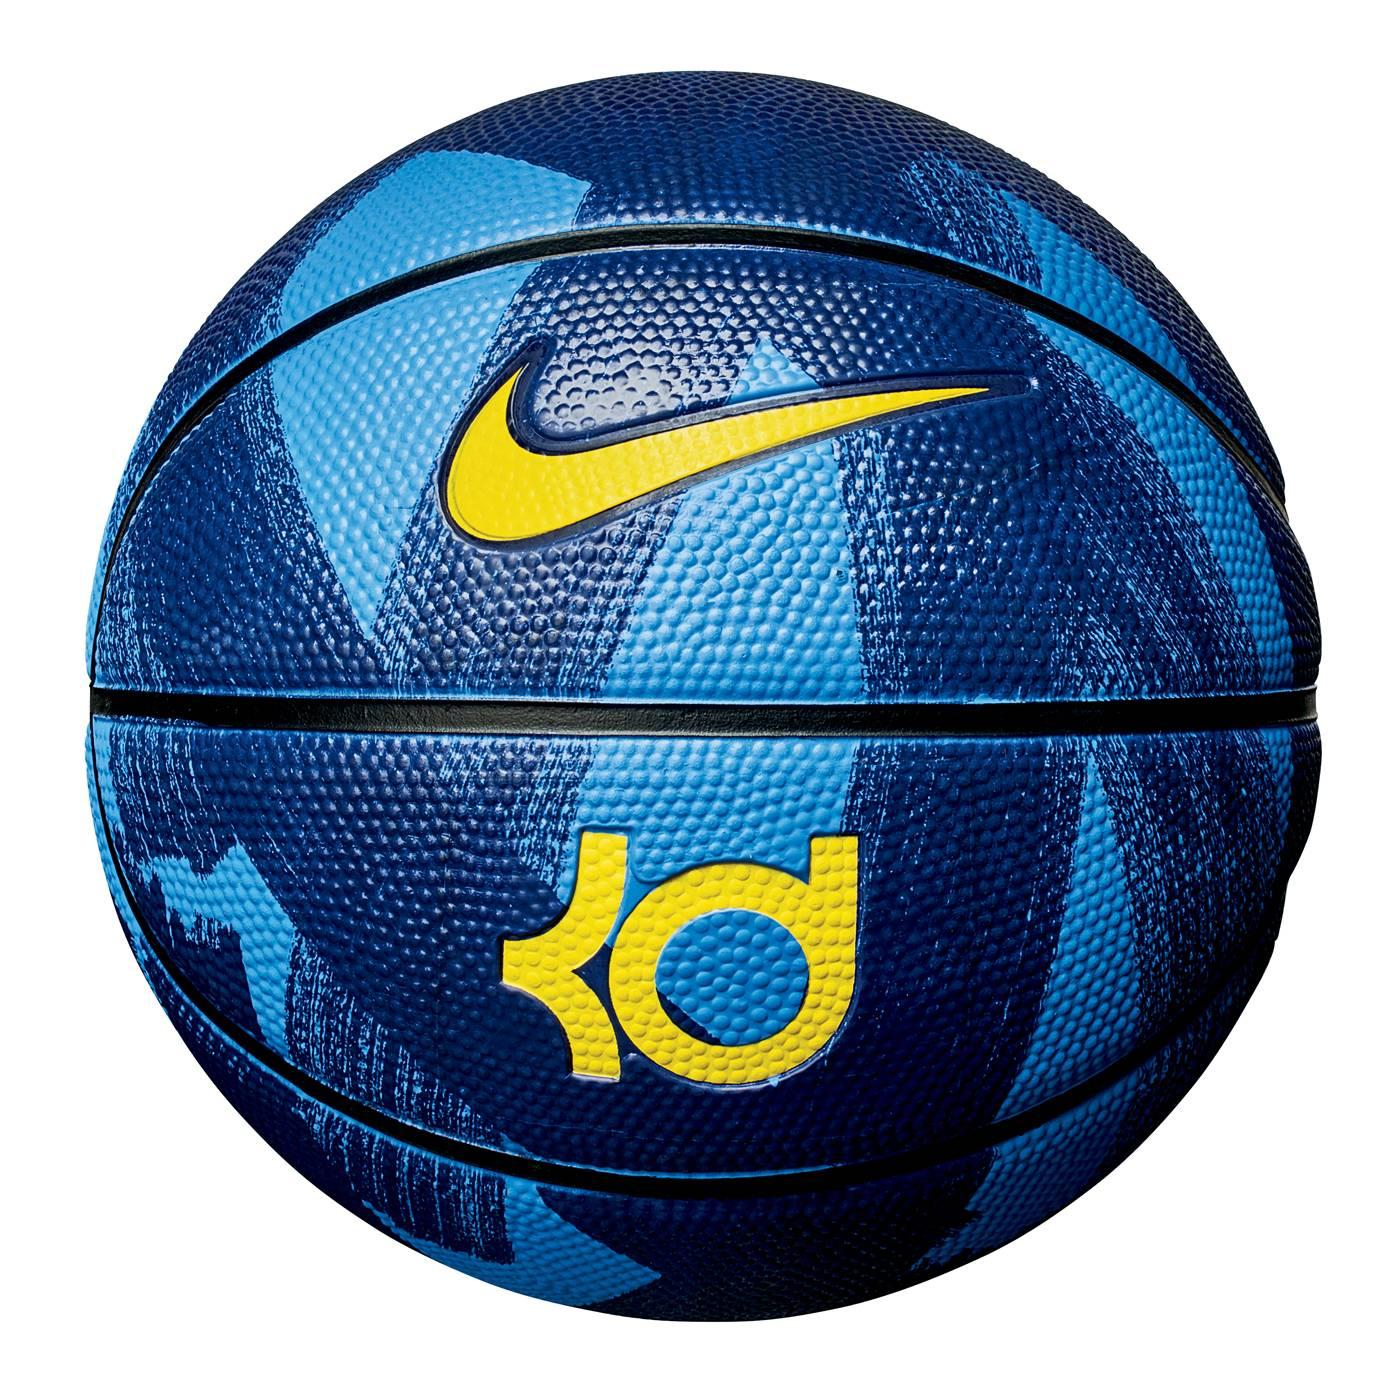 low priced 8d459 8276f Nike KD Playground 29.5